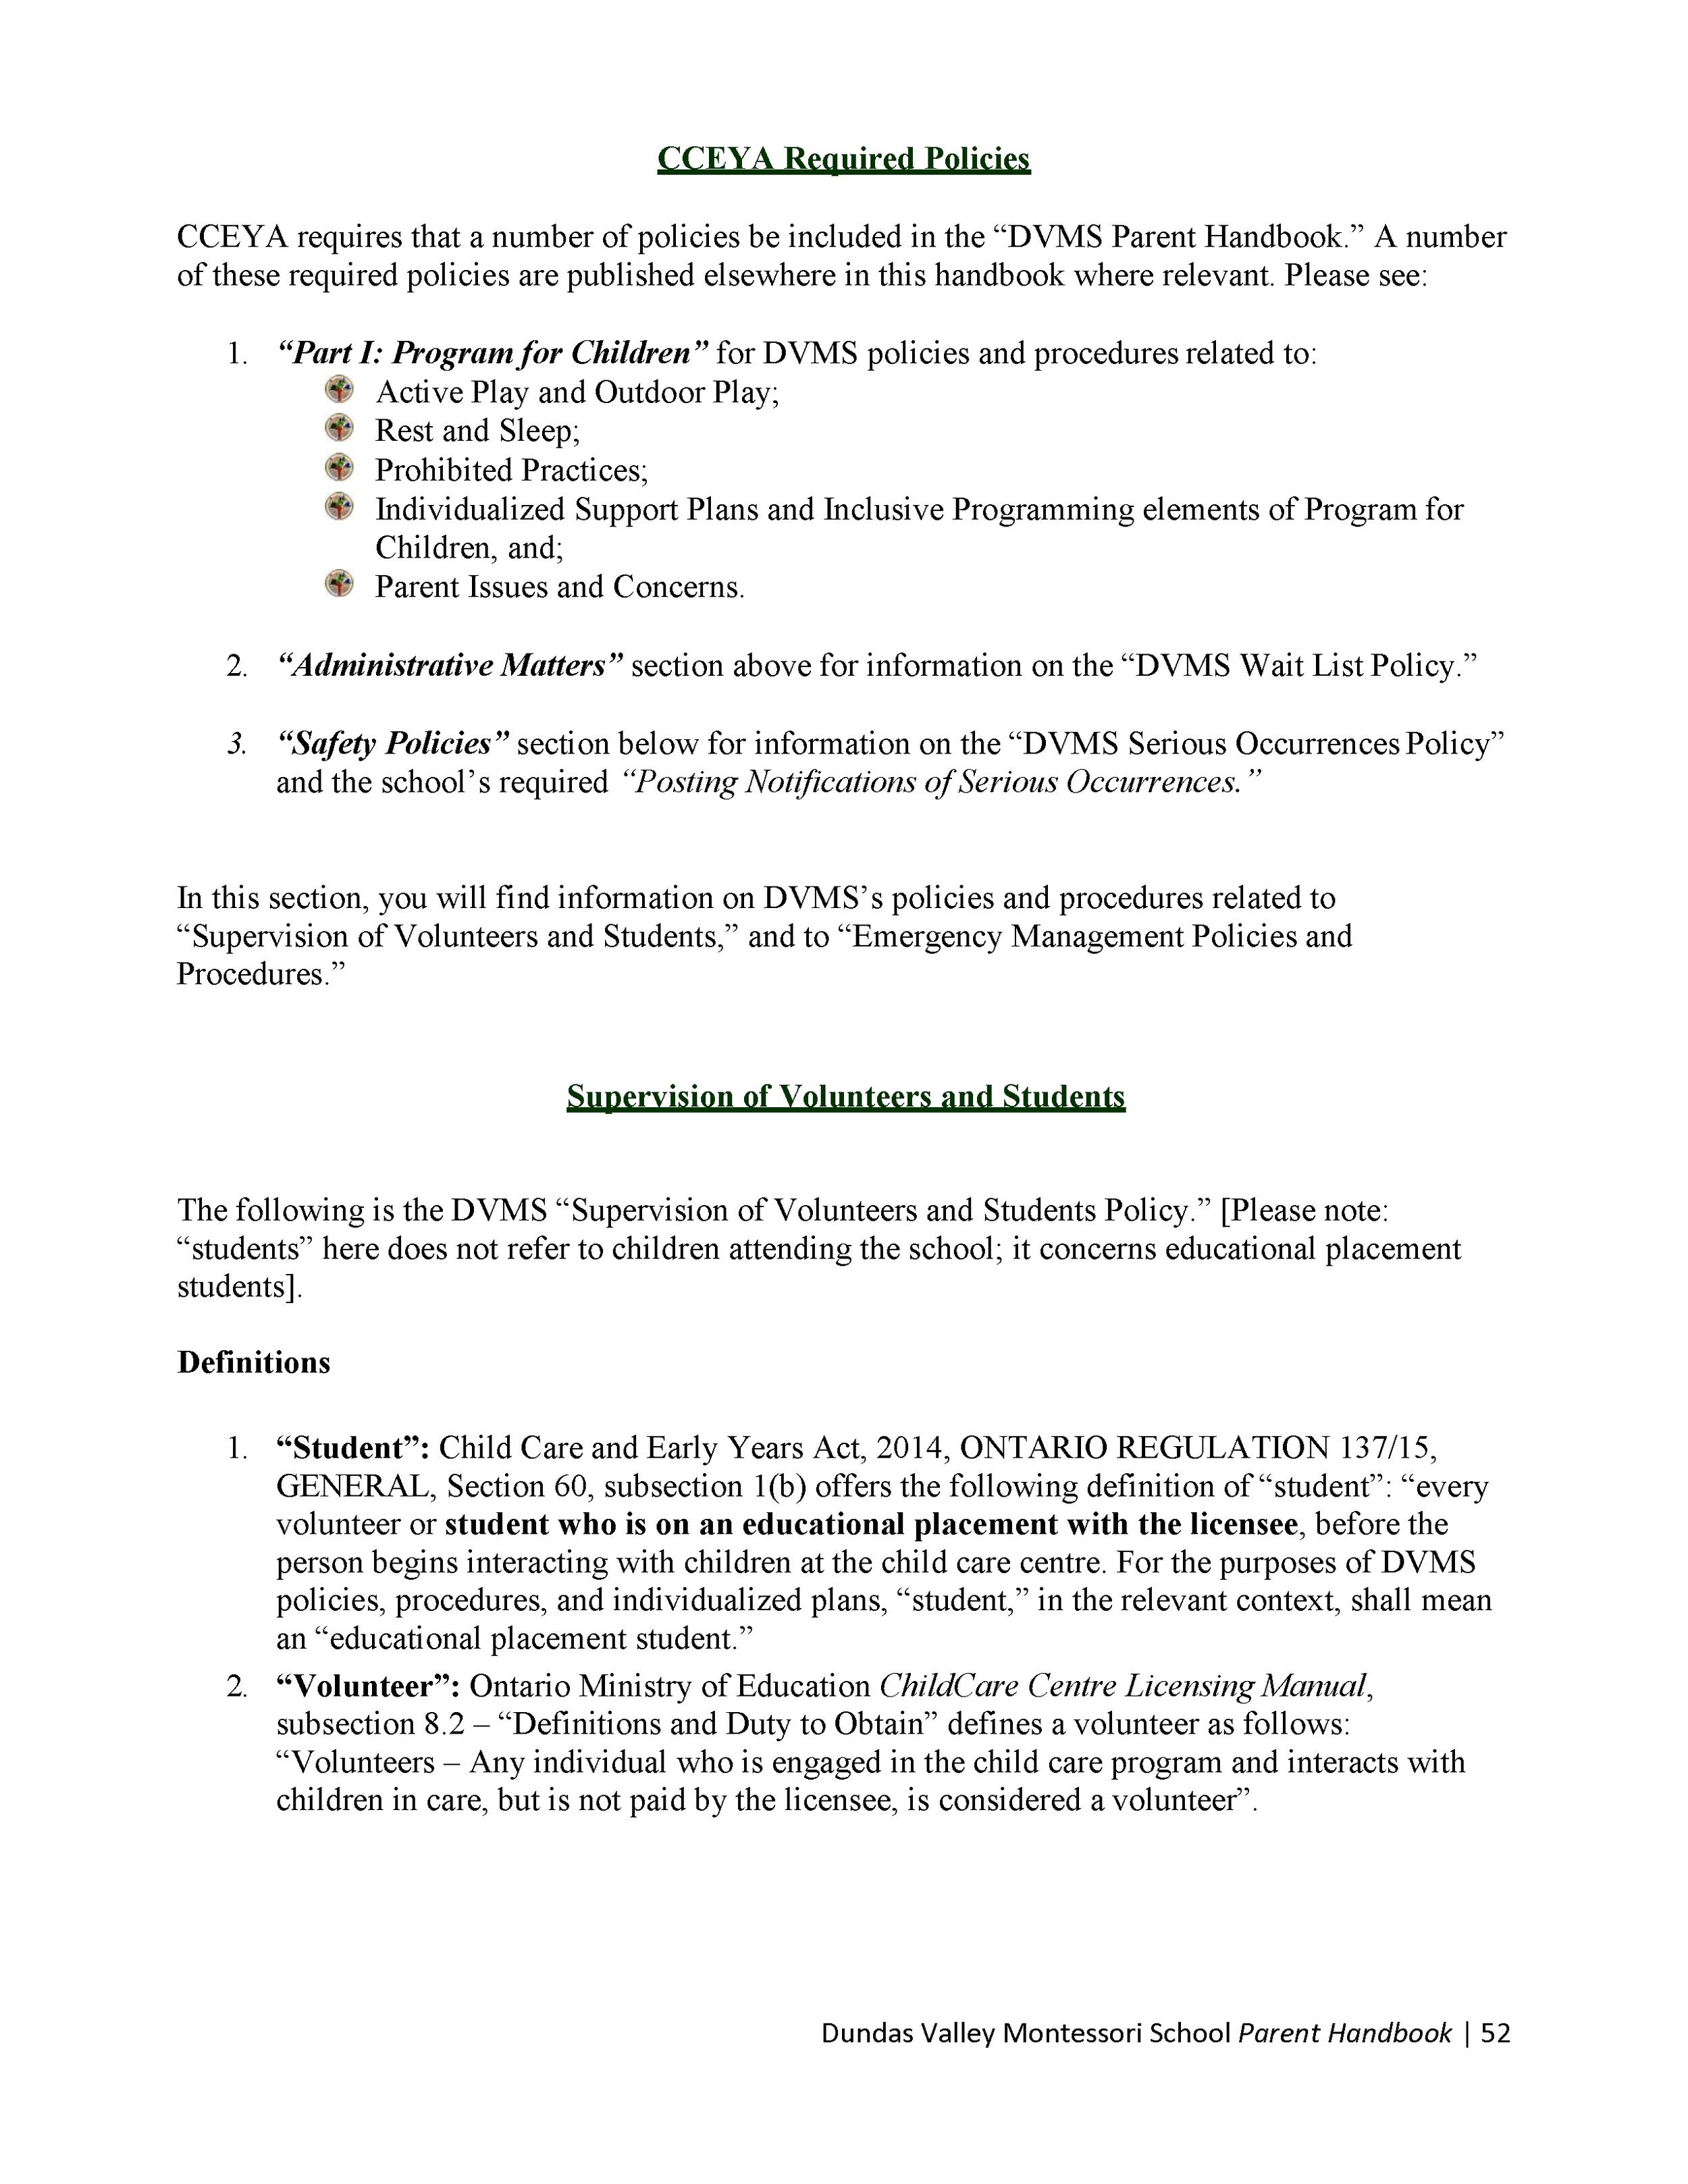 DVMS-Parent-Handbook-19-20_Page_054.png